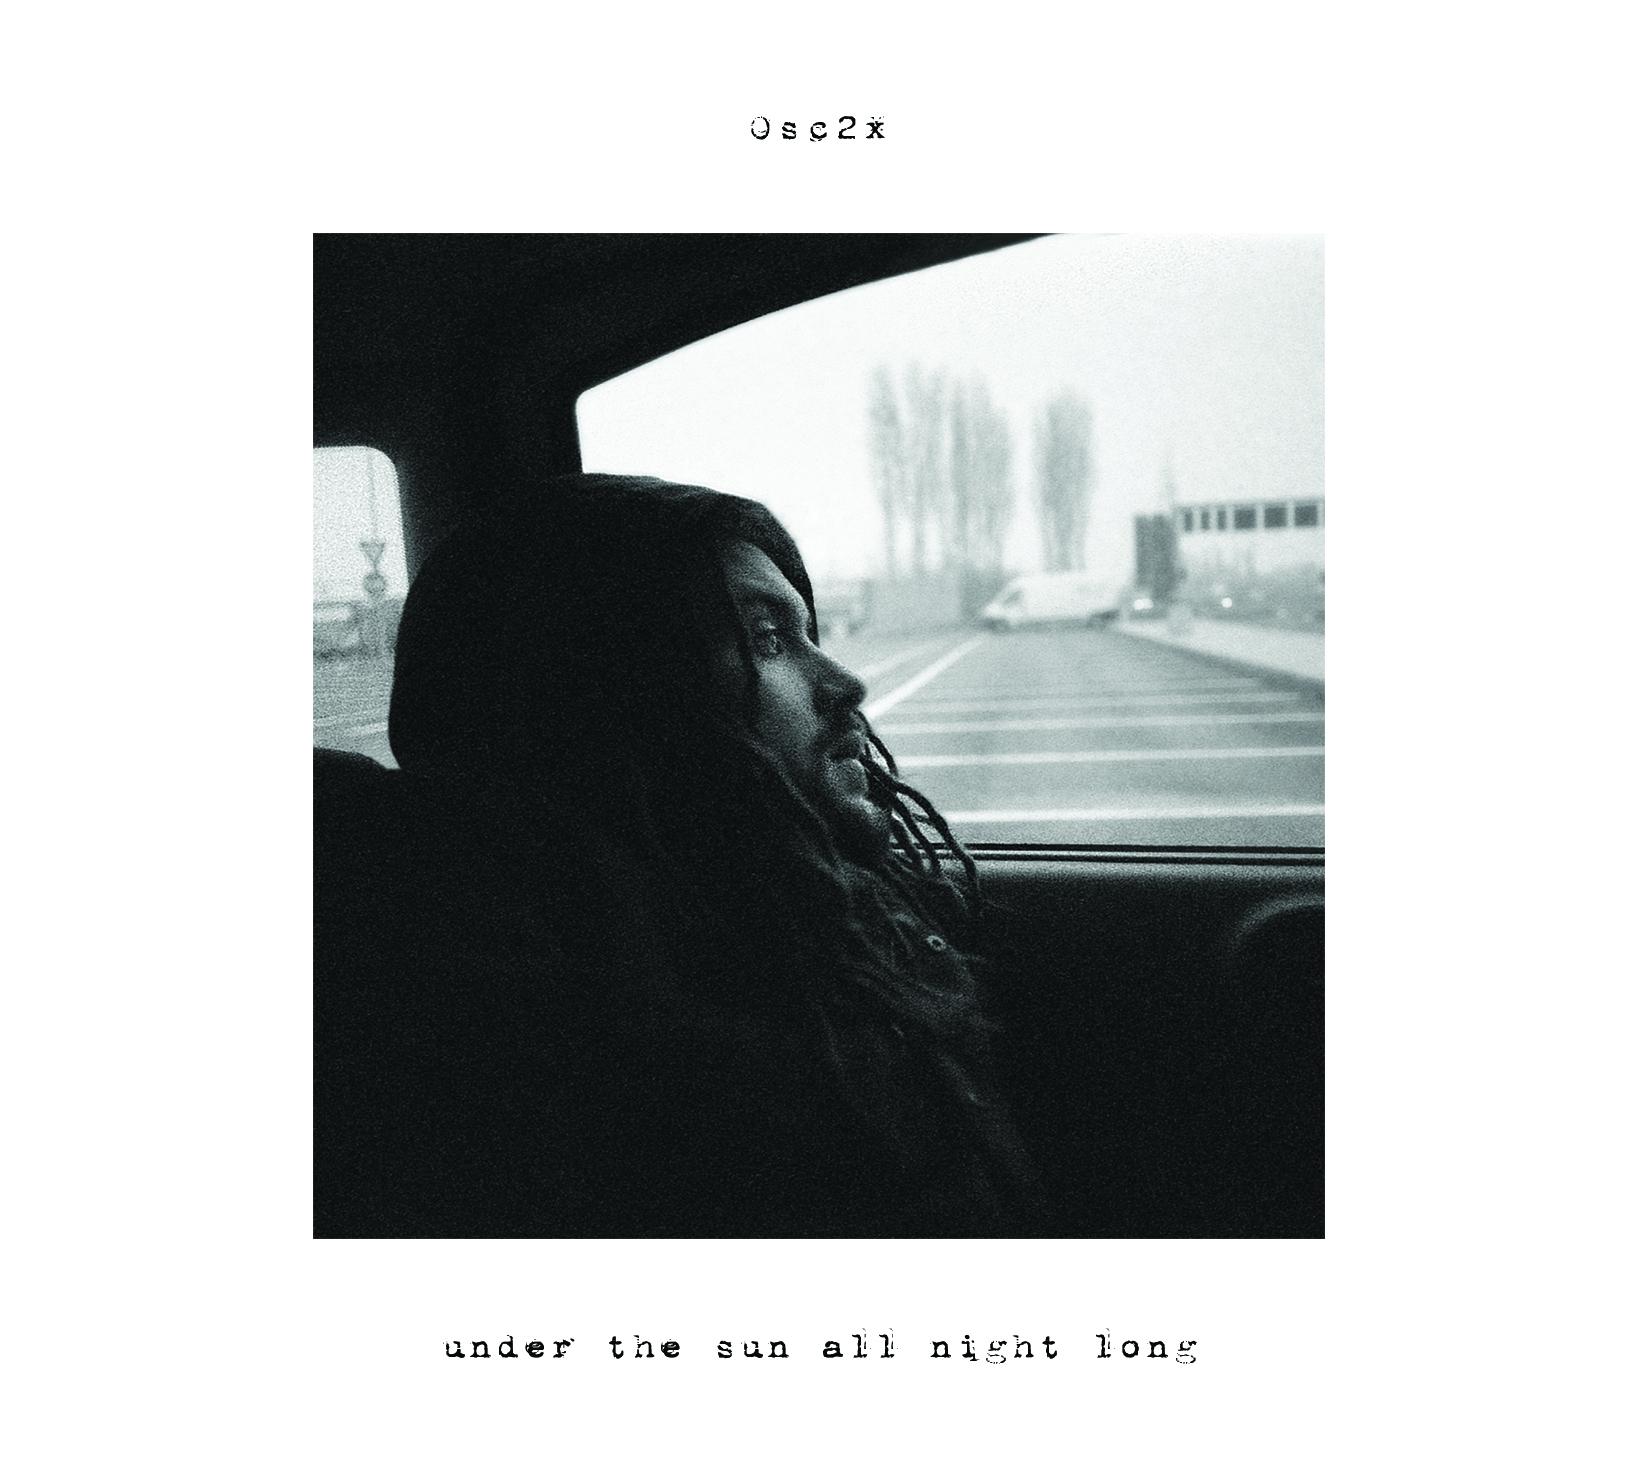 Osc2x - Under The Sun All Night Long